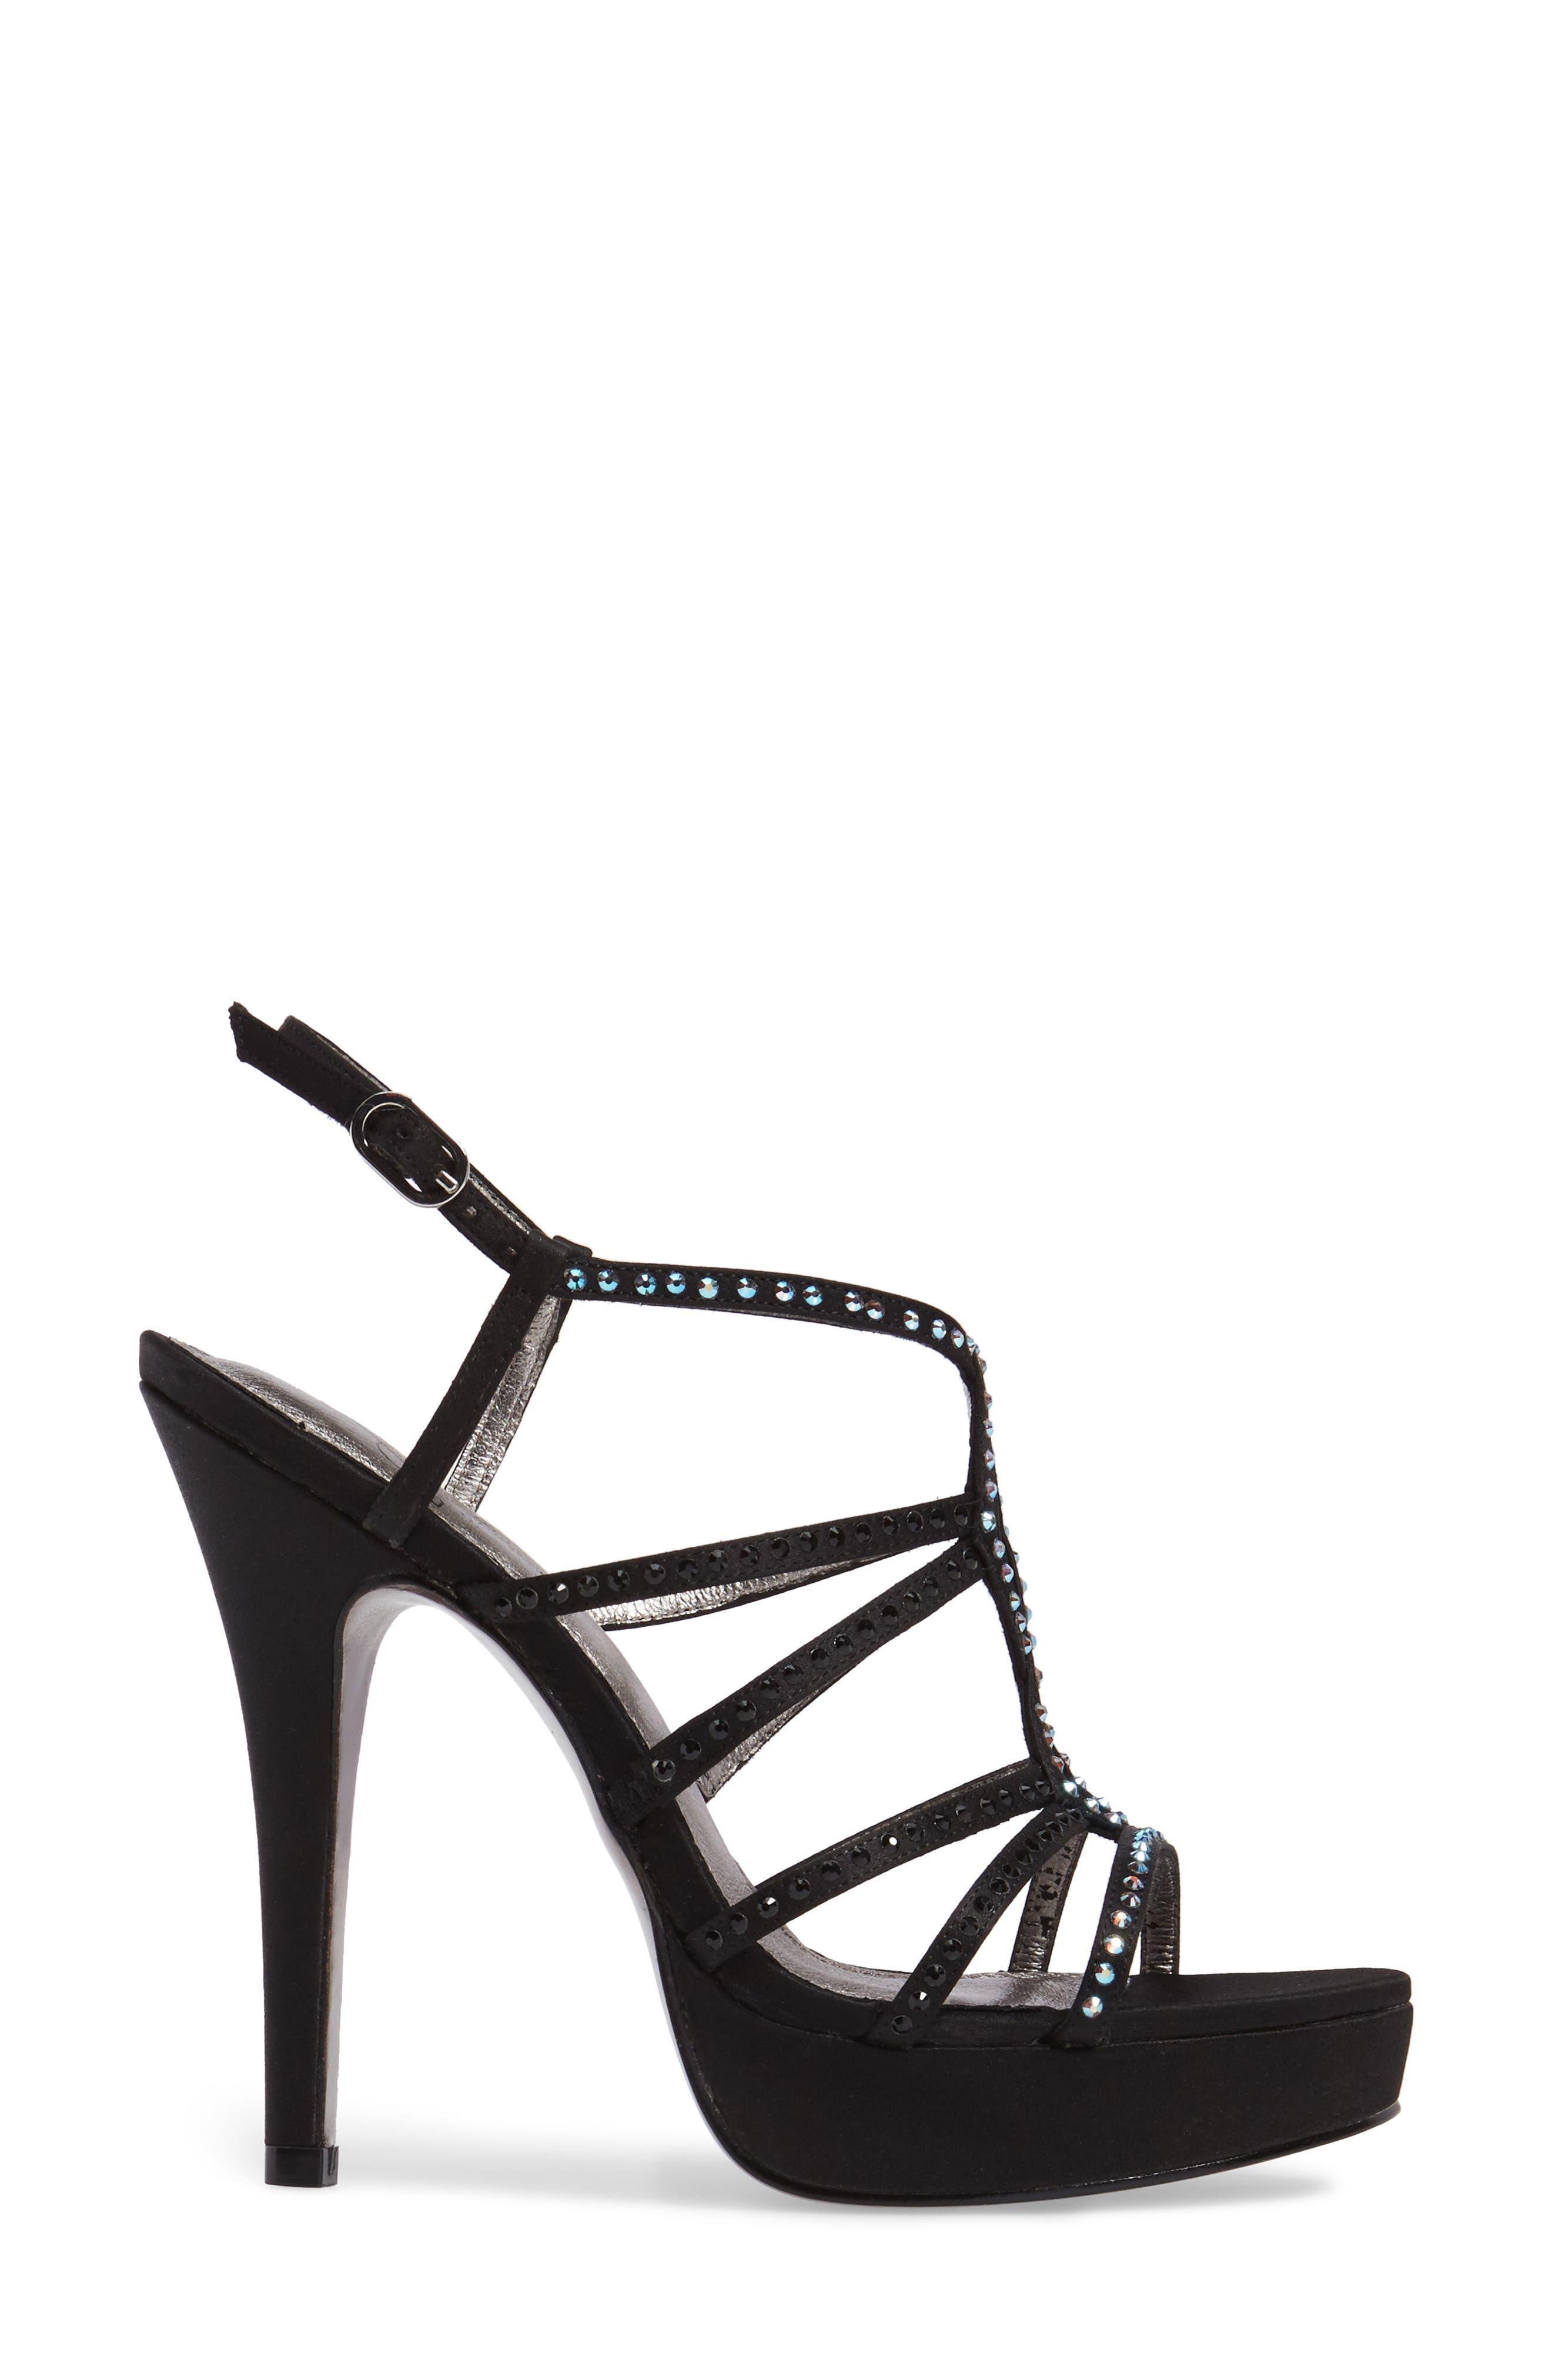 Alternate Image 3  - Adrianna Papell Miranda Embellished Platform Sandal (Women)